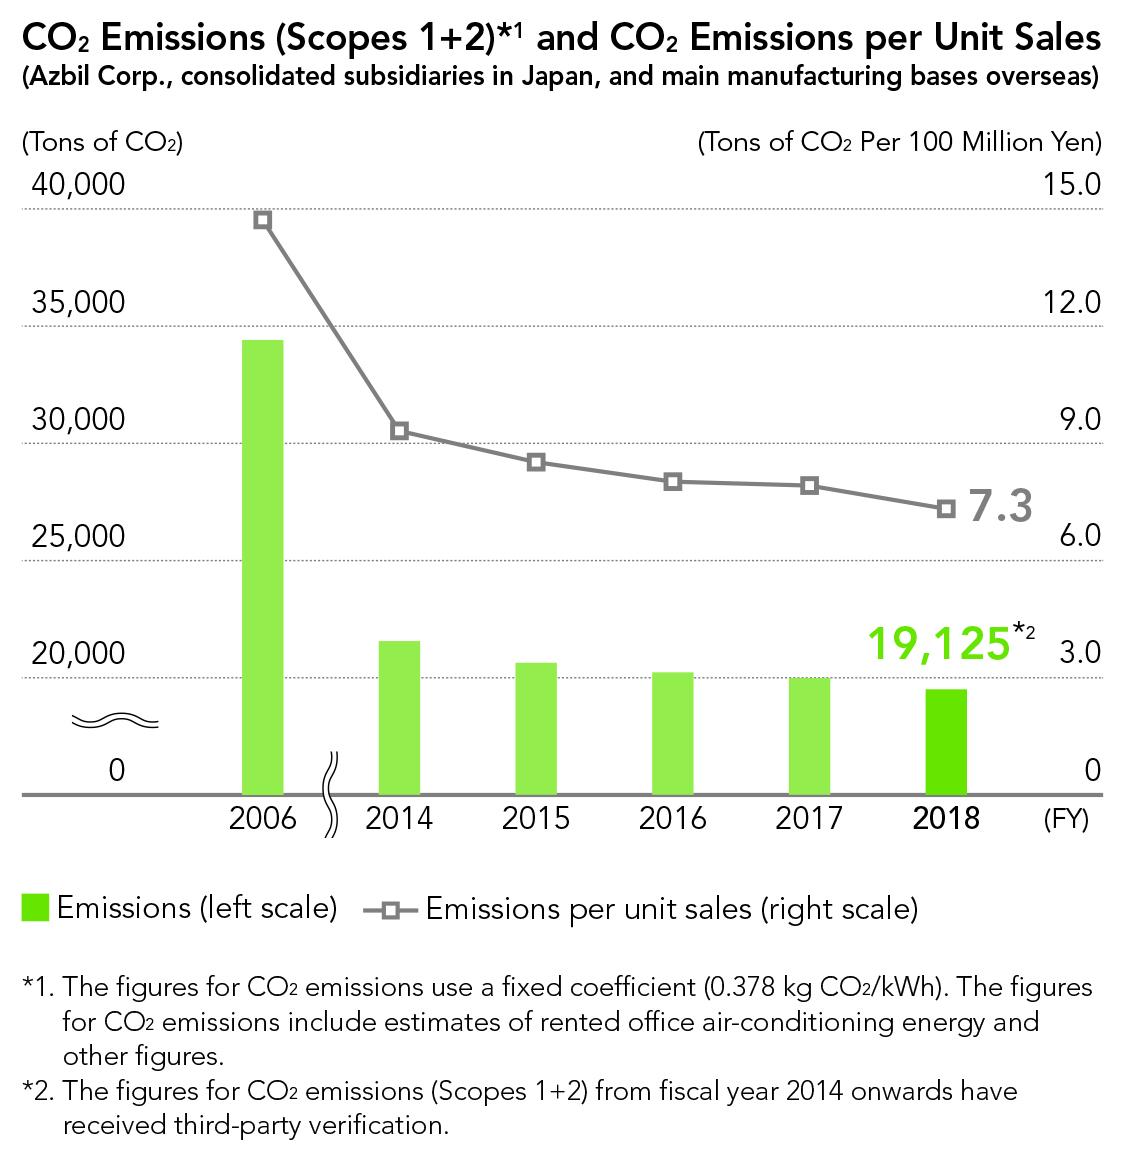 CO2 Emissions (Scope 1, 2) and CO2 Emissions per Unit Sales